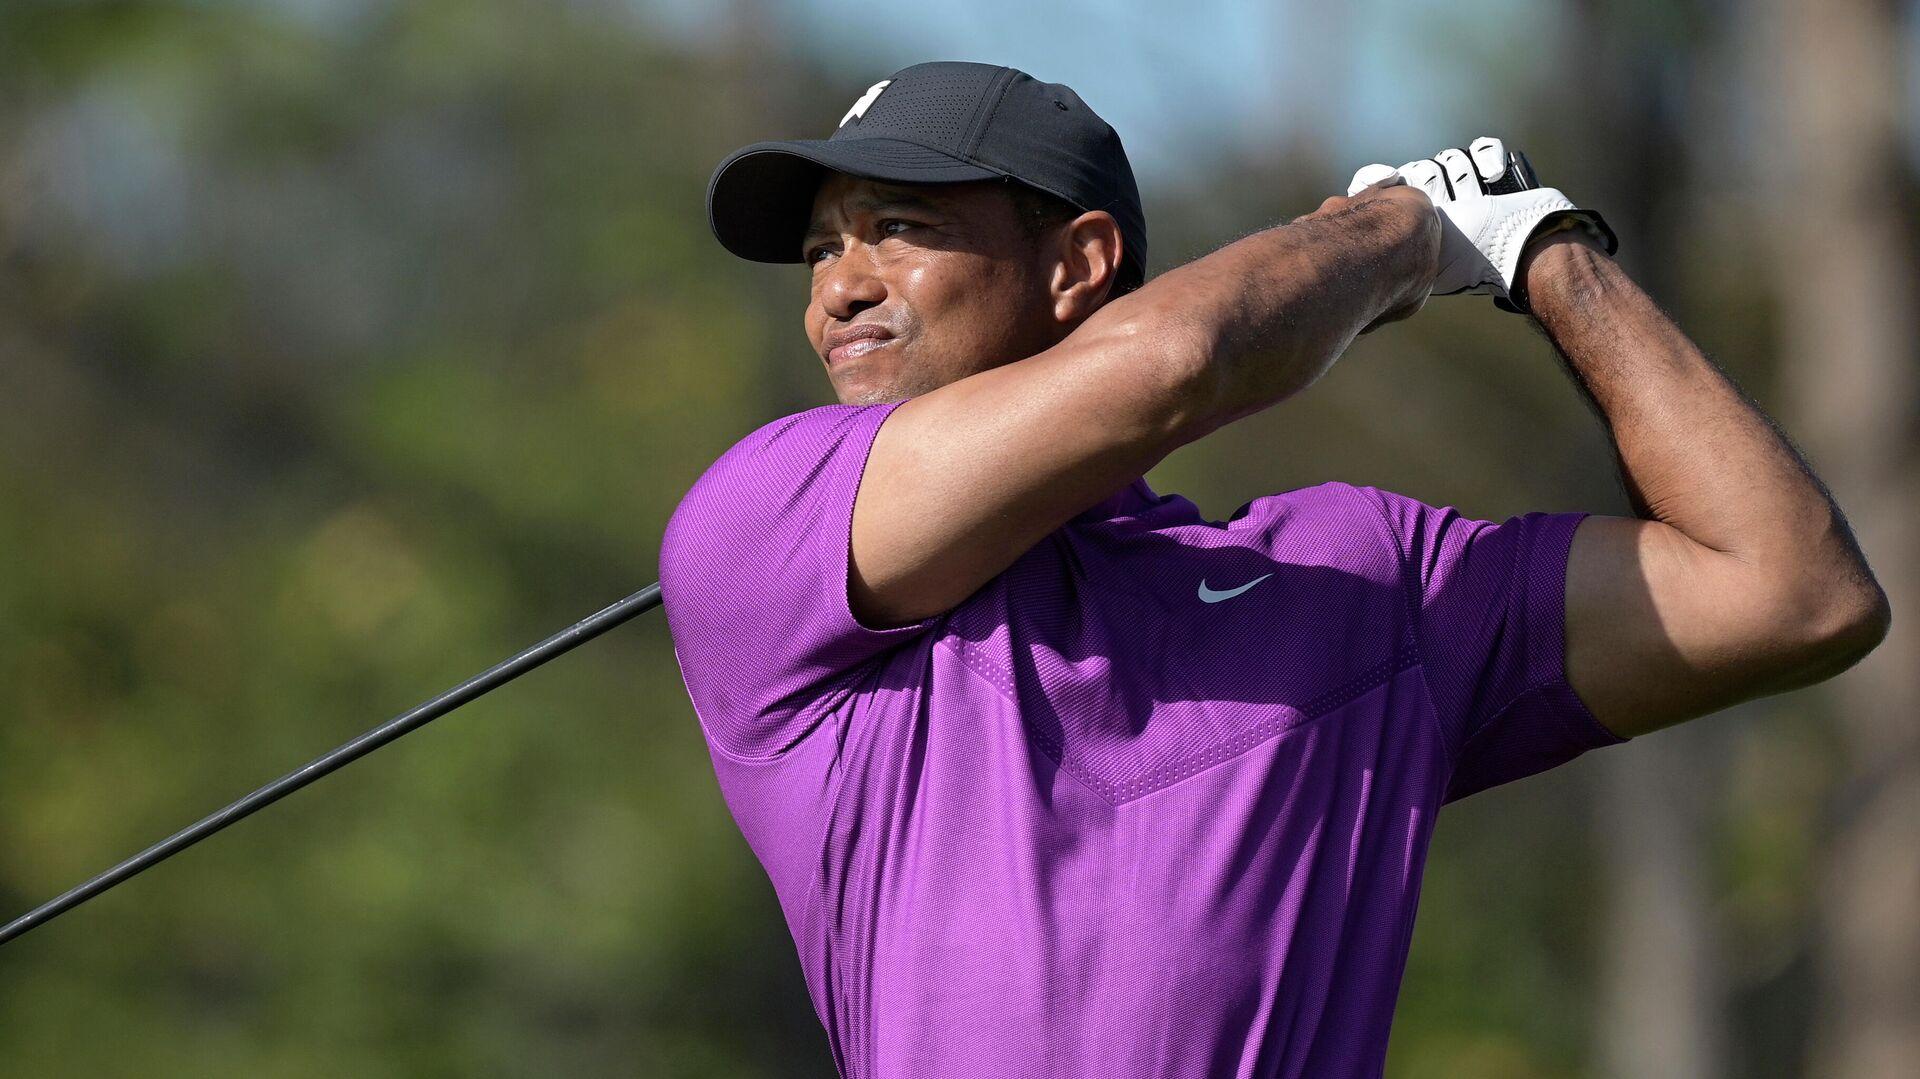 Tiger Woods, golfista - Sputnik Mundo, 1920, 25.02.2021